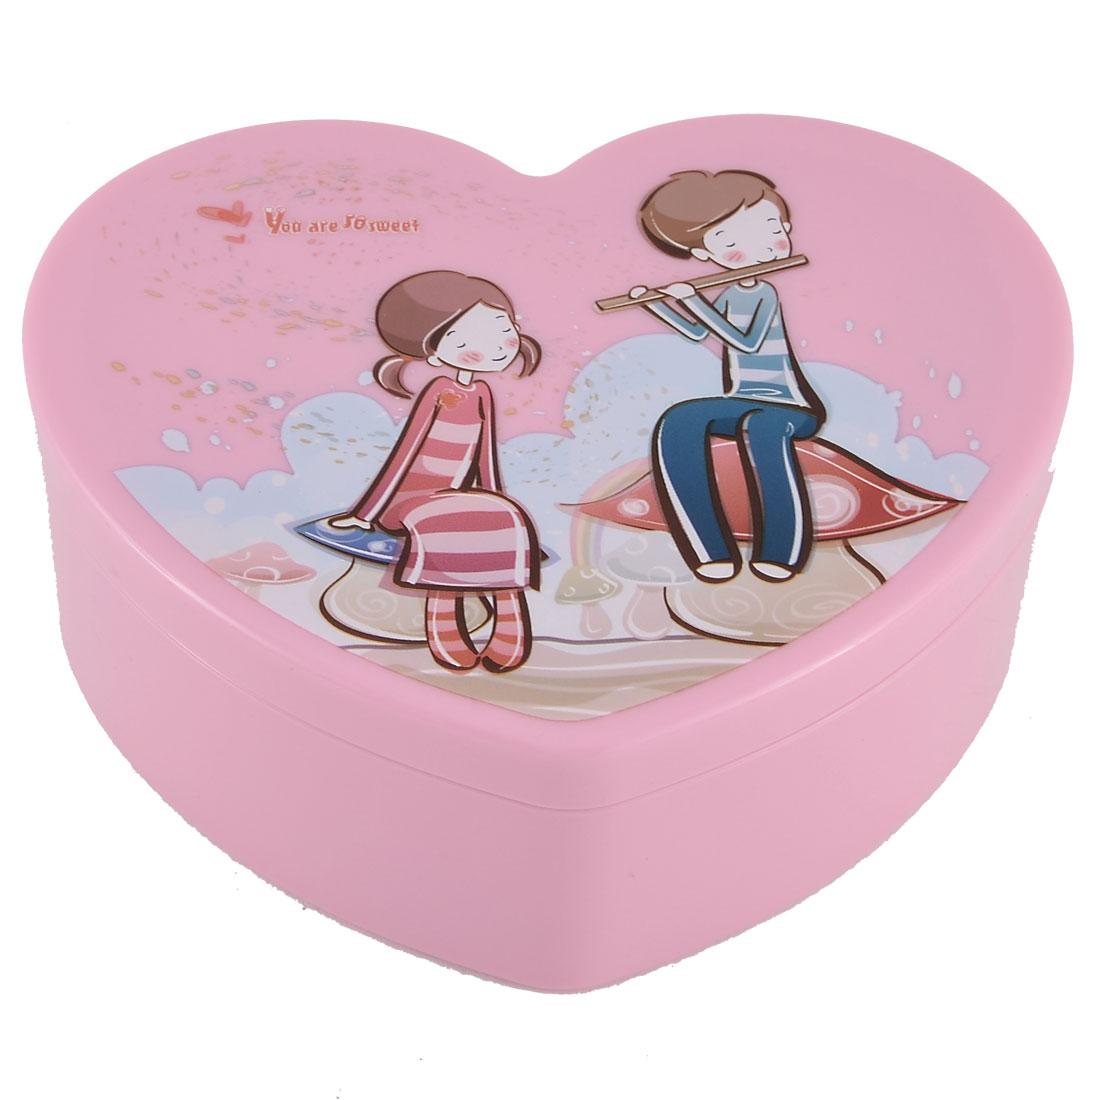 Dormitory Bracelet Necklace Plastic Couple Pattern Makeup Storage Case Rose Pink